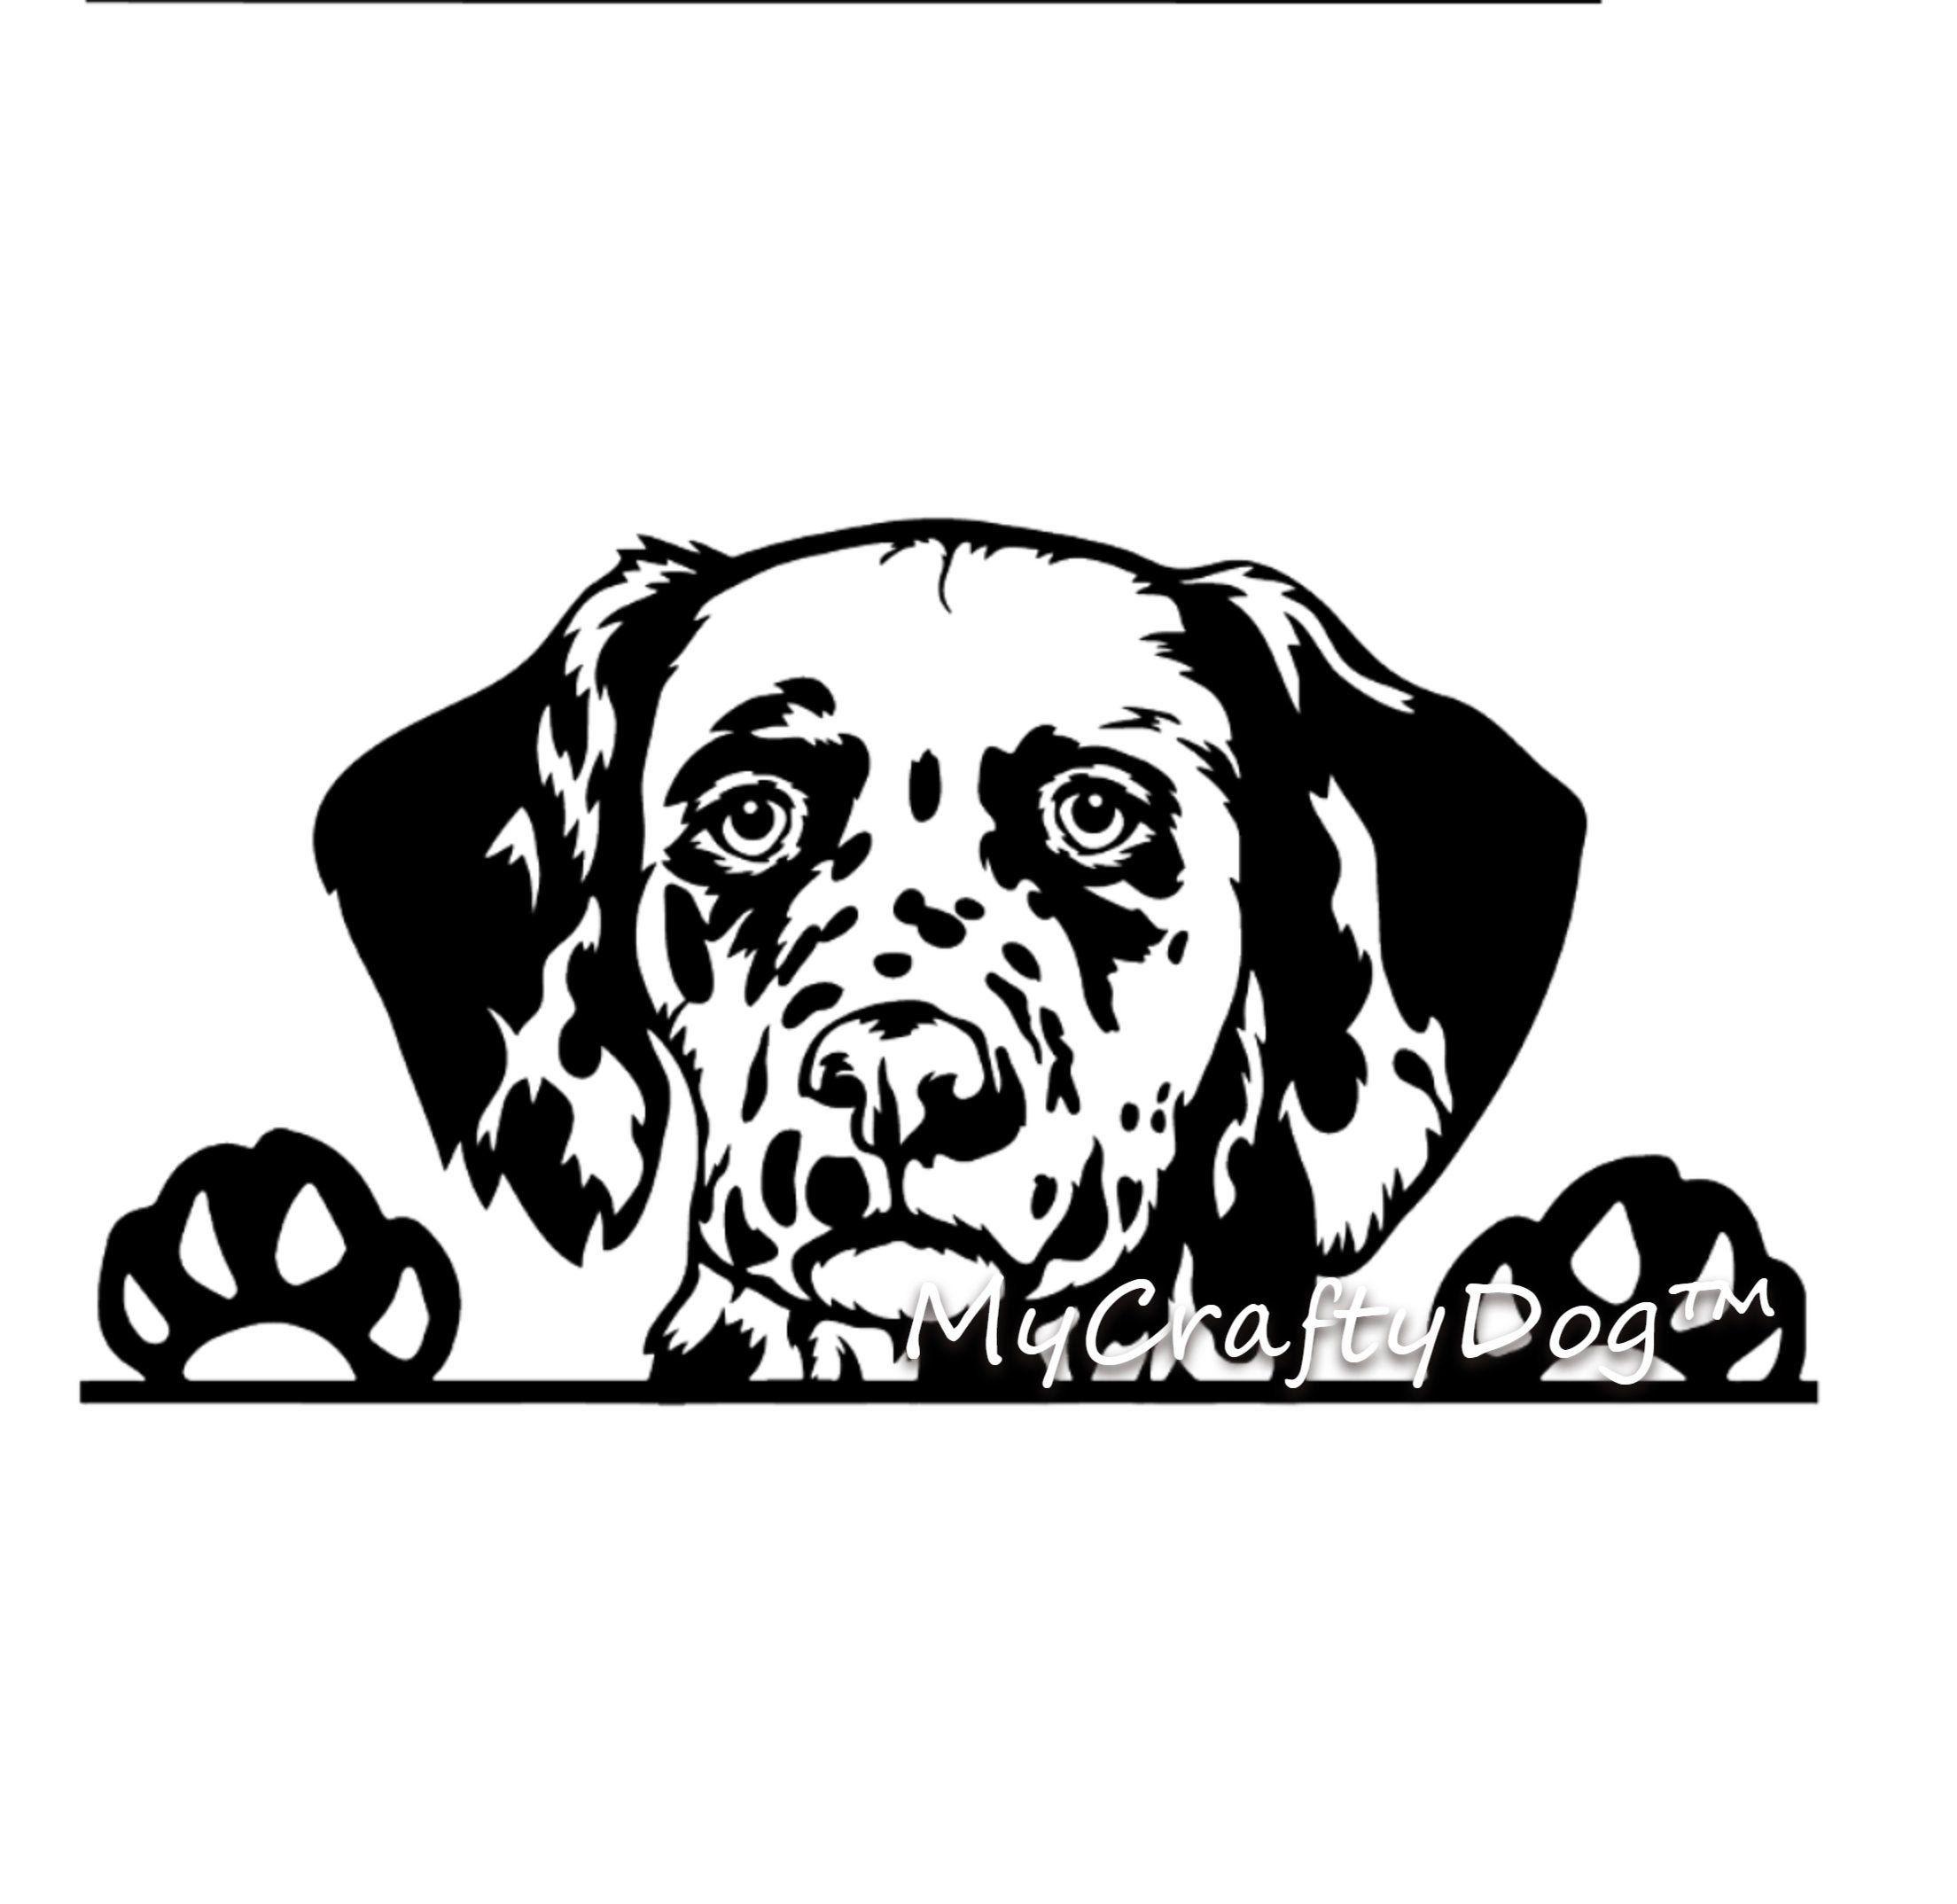 Dalmatian Peeking Dog Car Decal Sticker Dalmatian Dog Etsy Vinyl Car Stickers Dog Decals Car Decals Stickers [ 2148 x 2208 Pixel ]